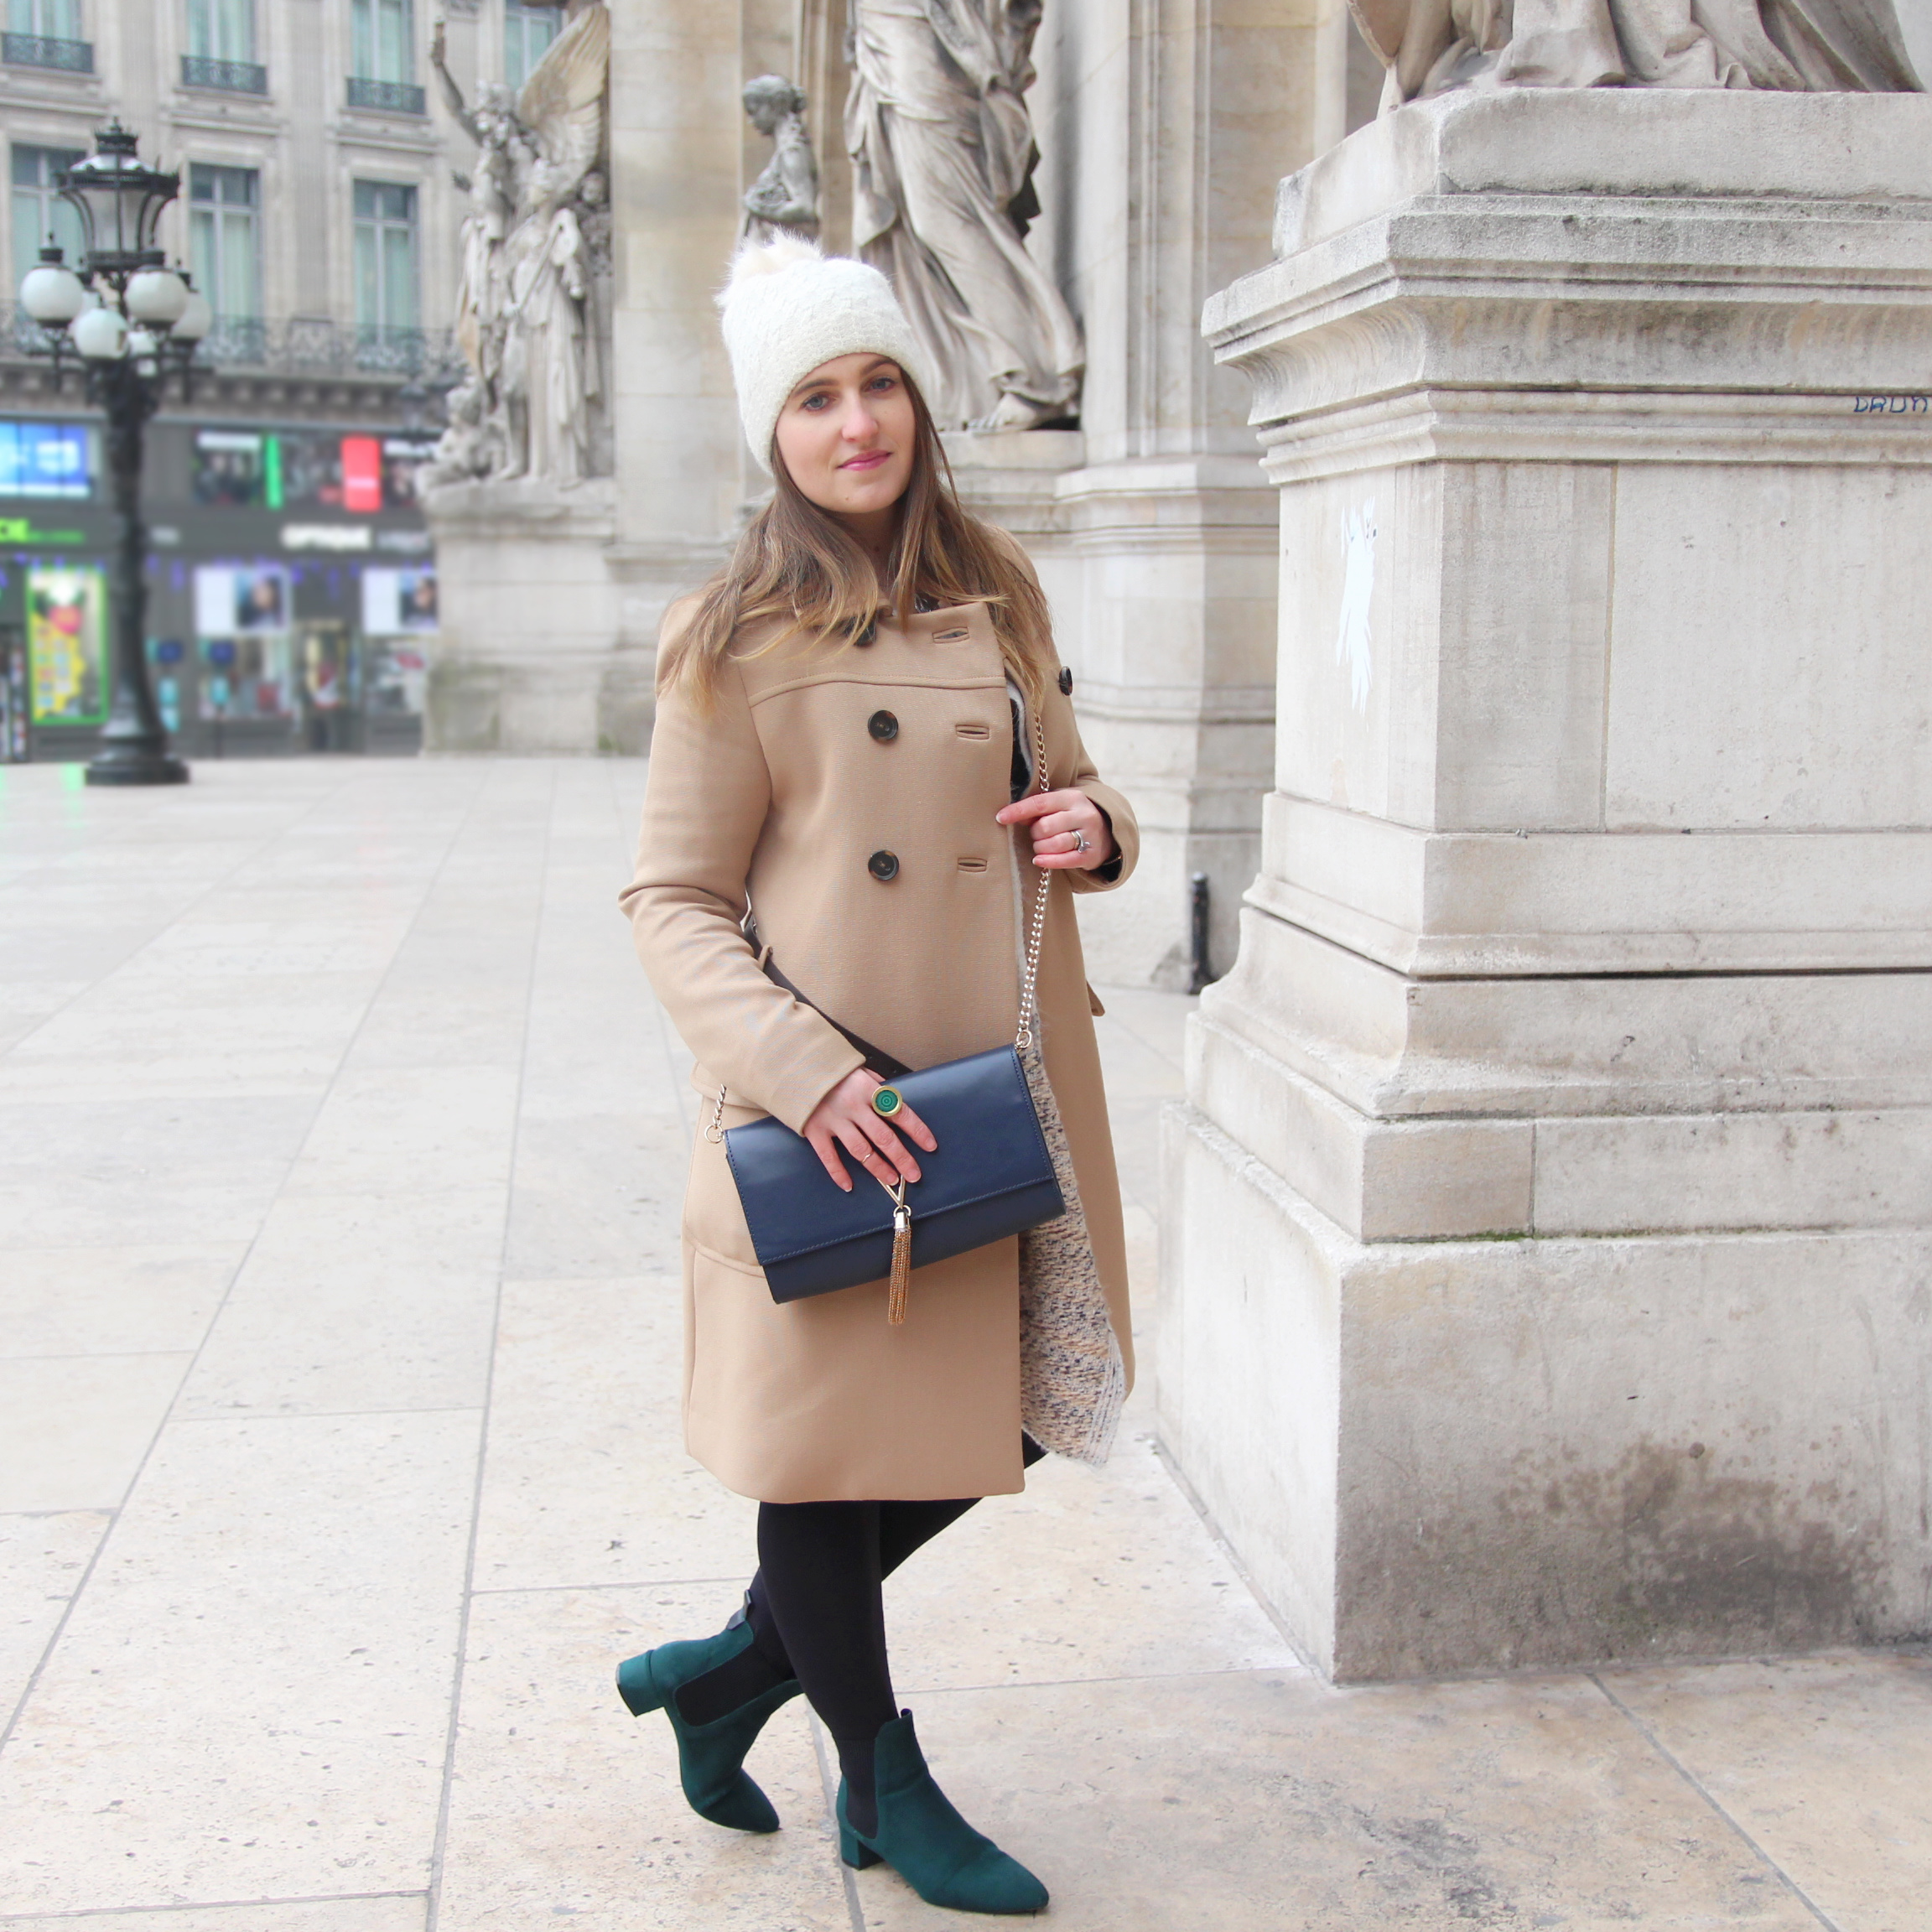 paris-opera-garnier-winter-day-influencer-style-personalstylist-imageconsultant-seralynepointcom-img_6638